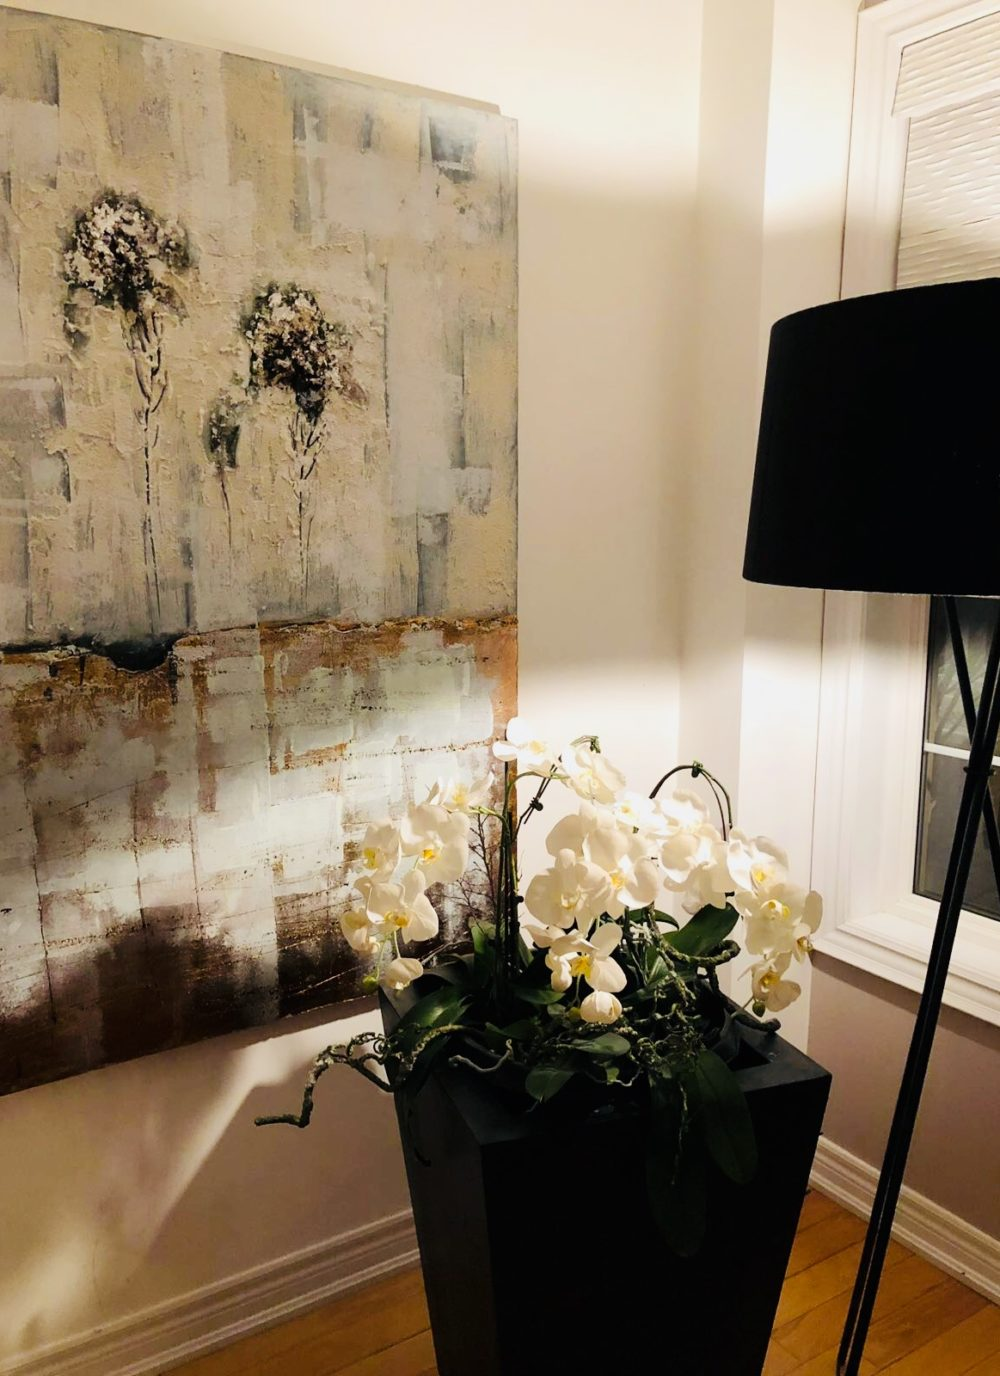 interior lighting designer fluorescent interior lighting designer and light architect in toronto